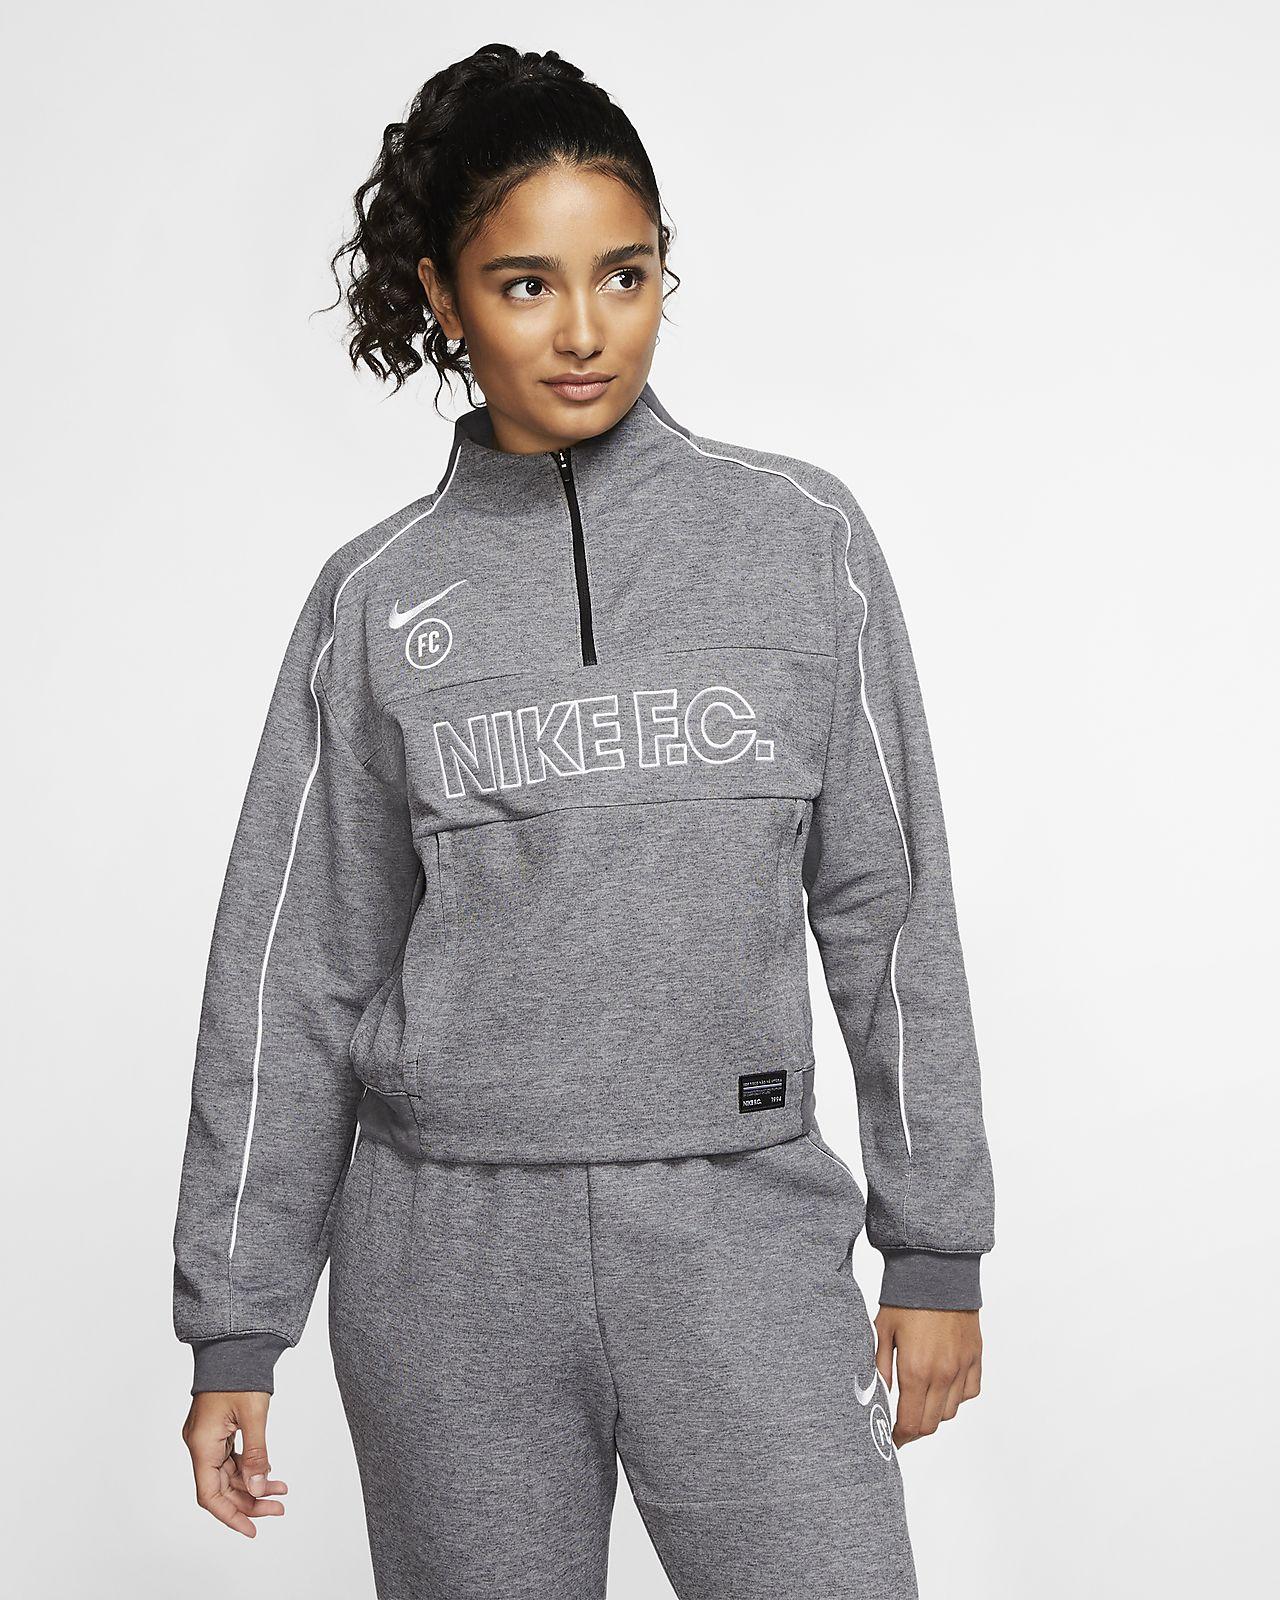 Nike F.C. Women's Football Jacket